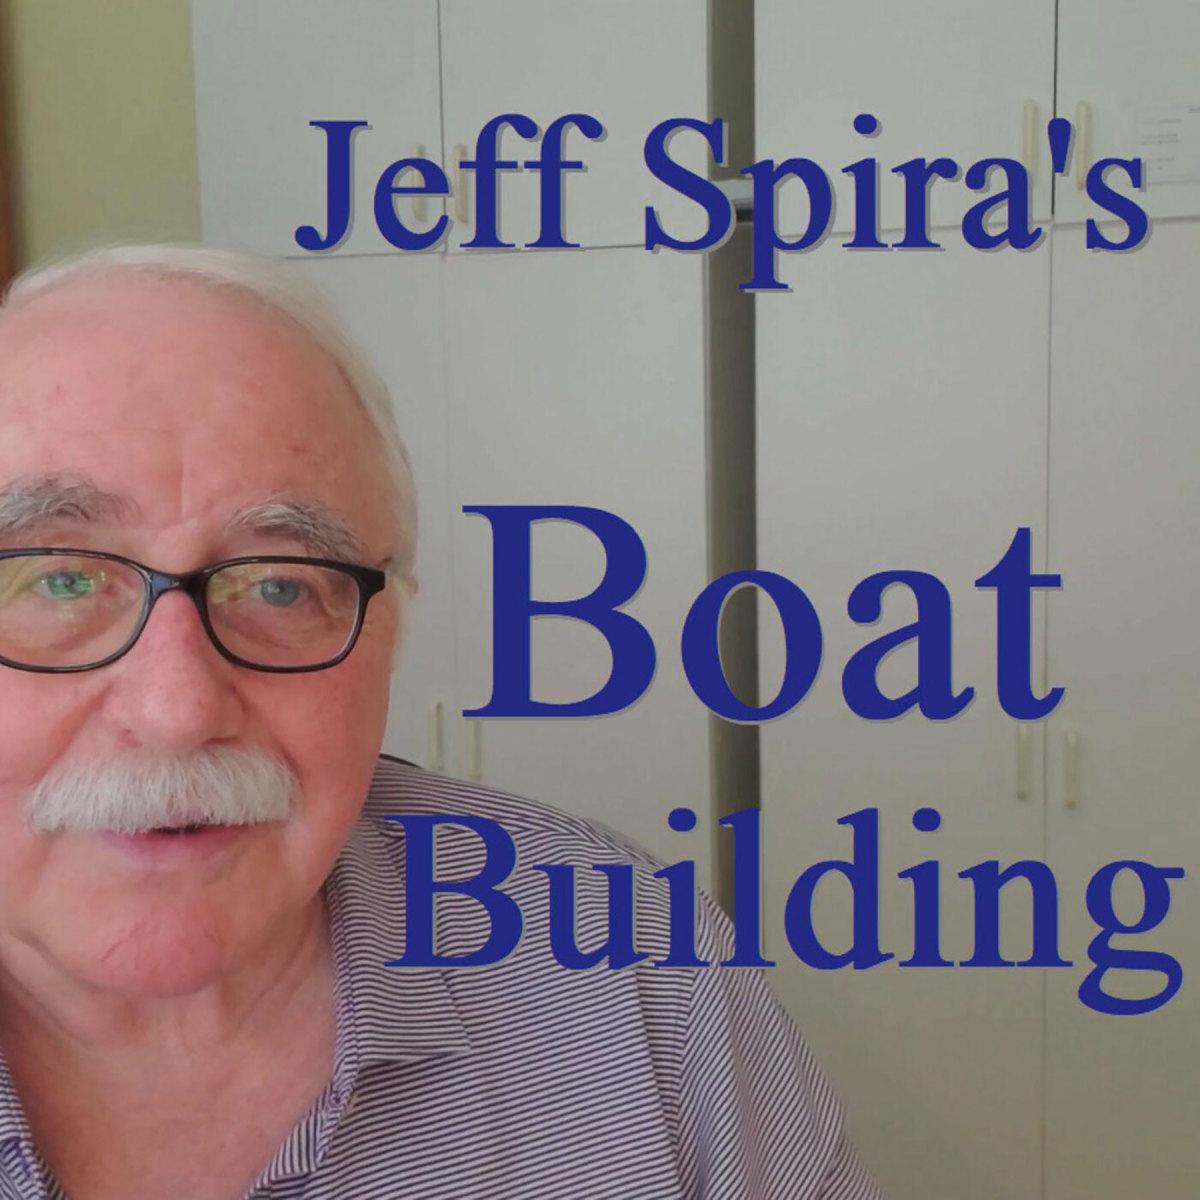 spira-boat-building-qkYguAEvCUG-d_KI-920YqX.1400x1400